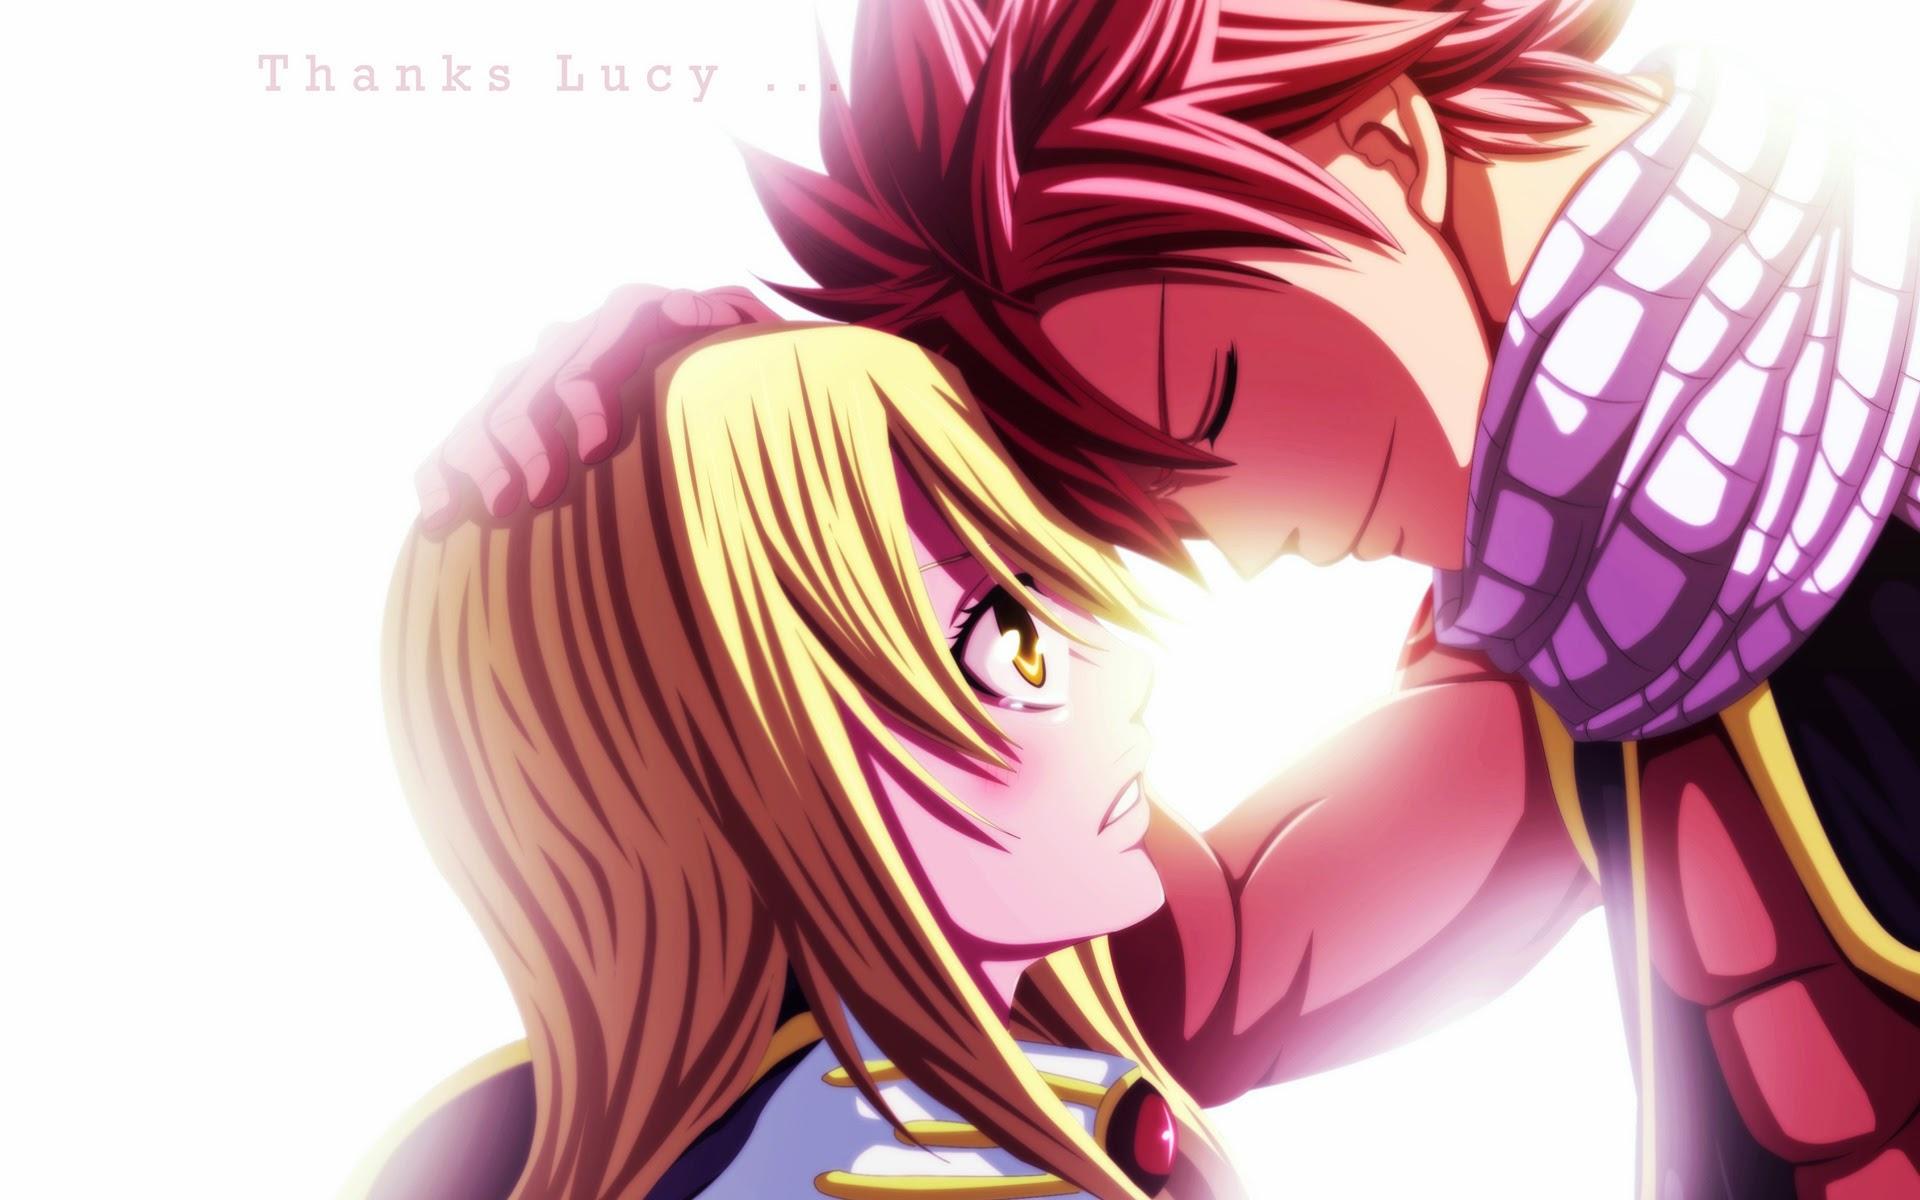 lucy heartfilia and natsu dragneel fairy tail anime hd wallpaper 1920x1200